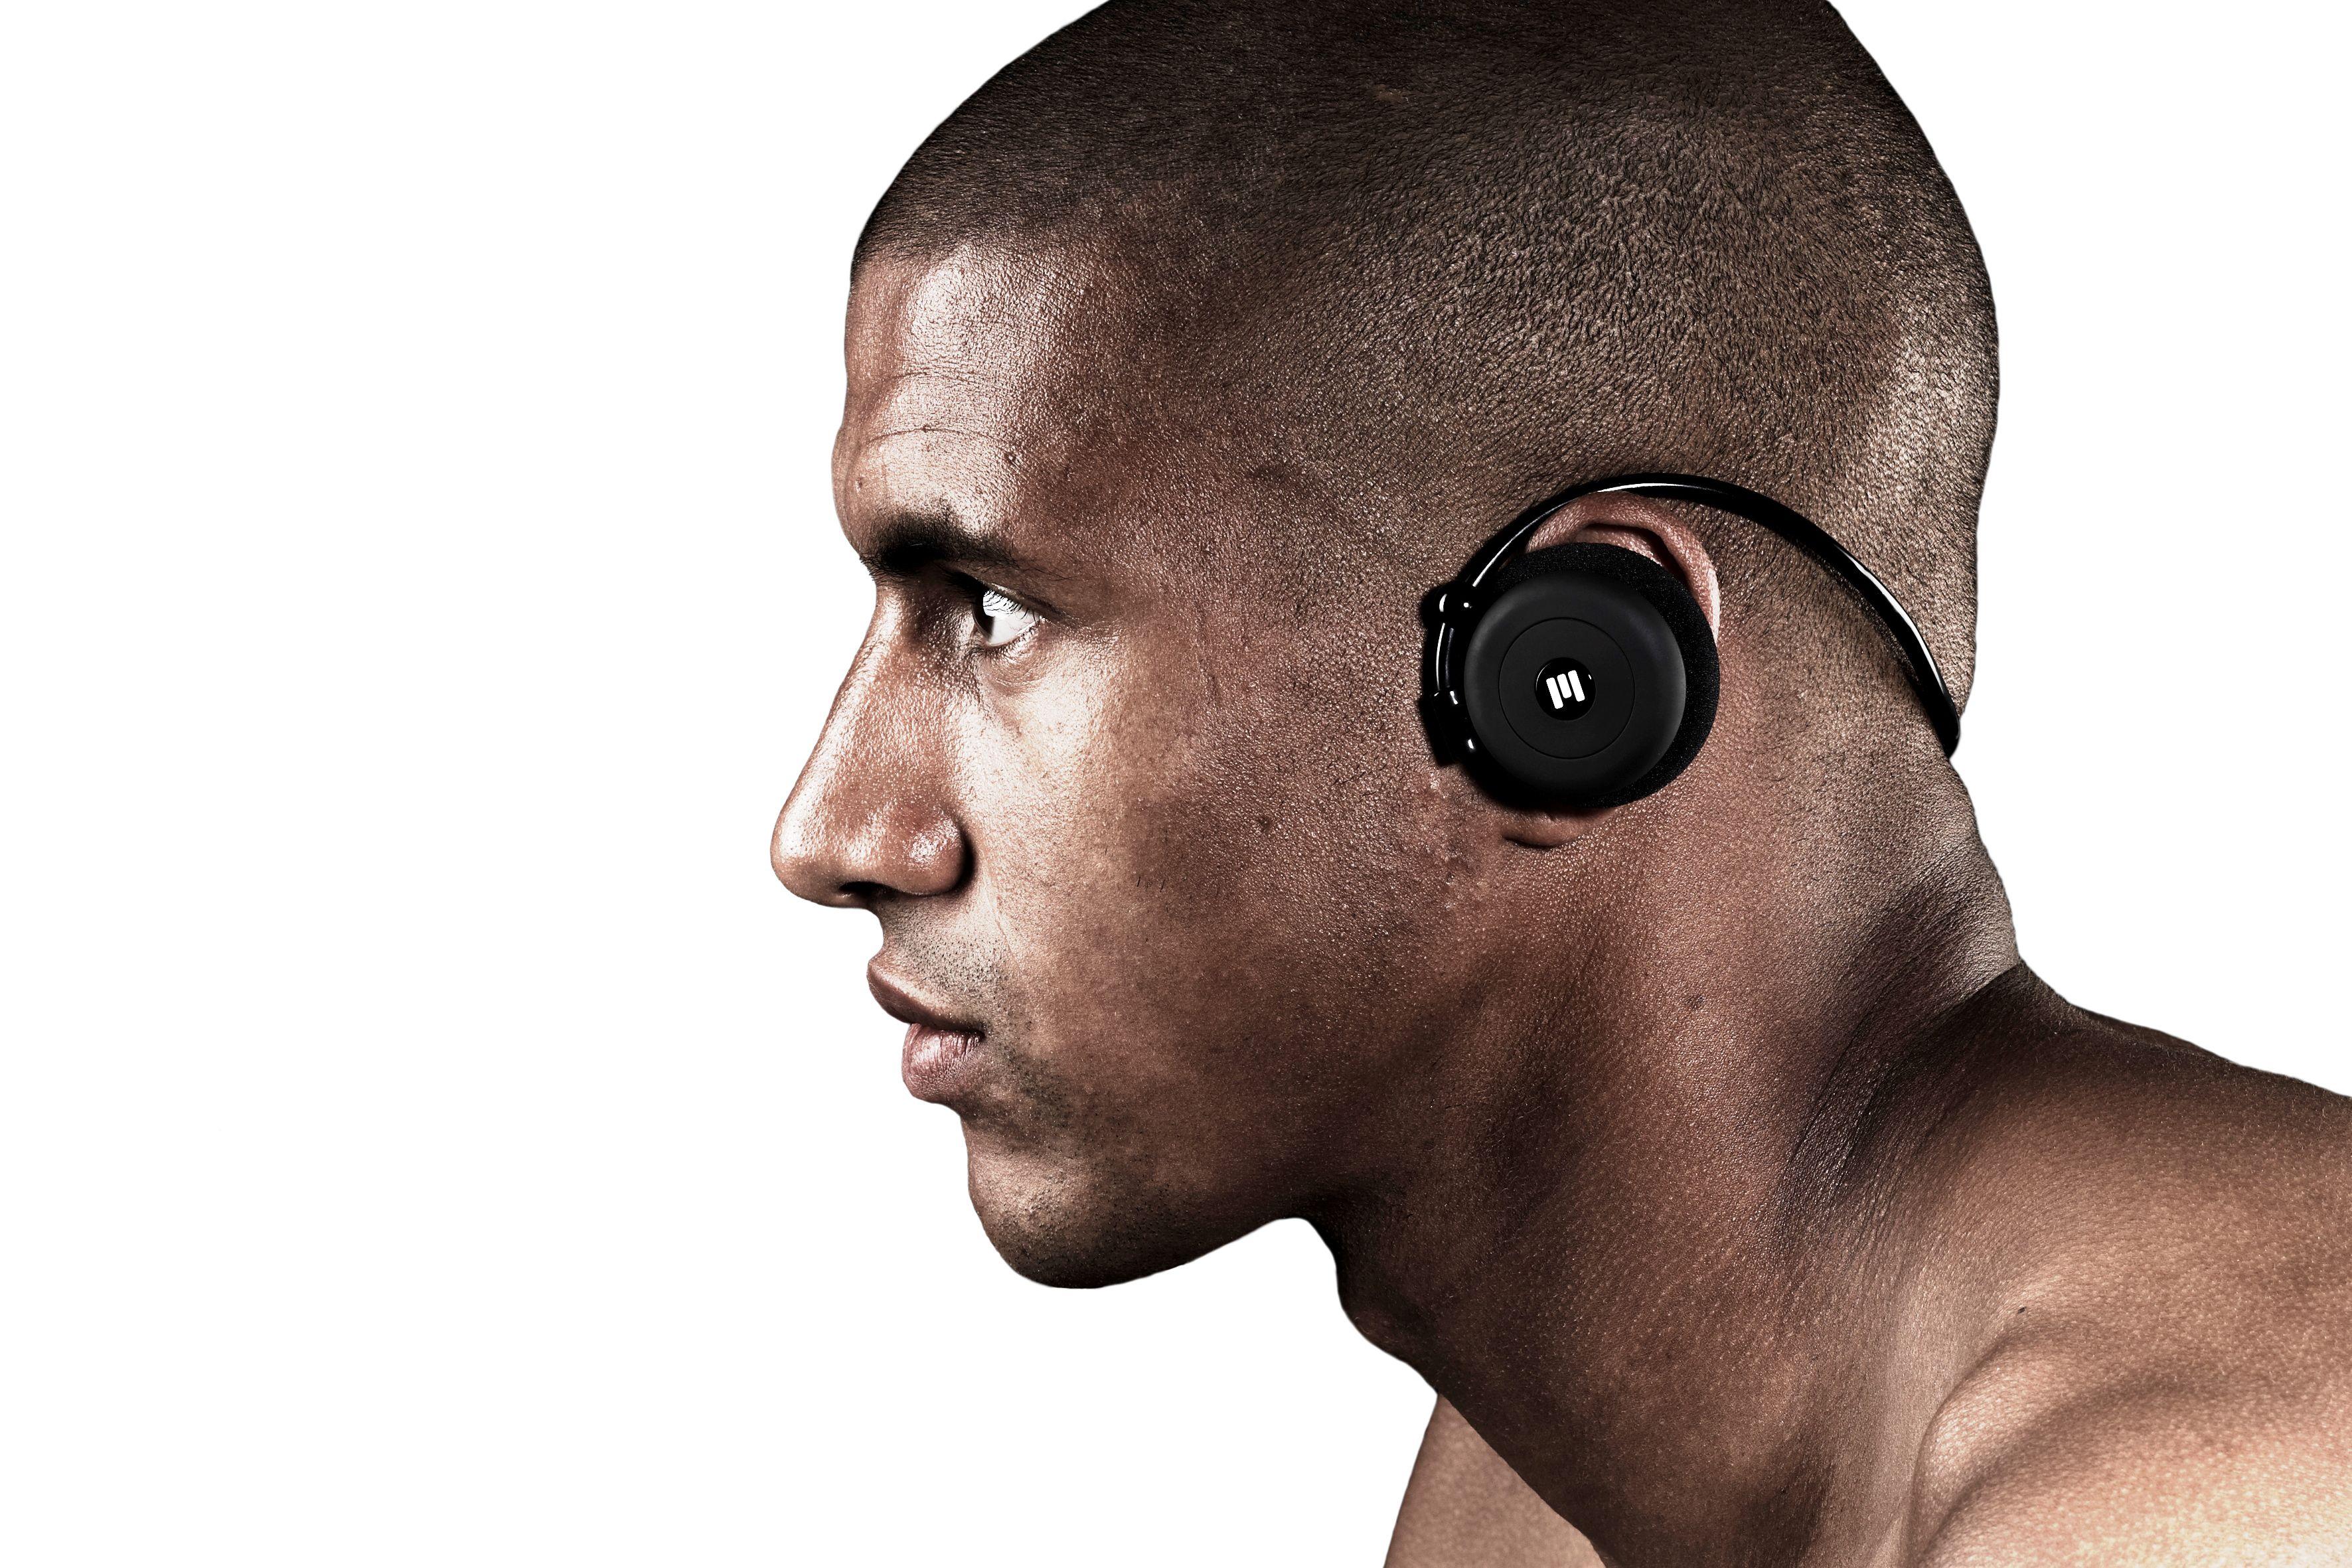 On-ear wireless headphones AL3 Freedom from MIIEGO  http://bit.ly/1A3WAdI